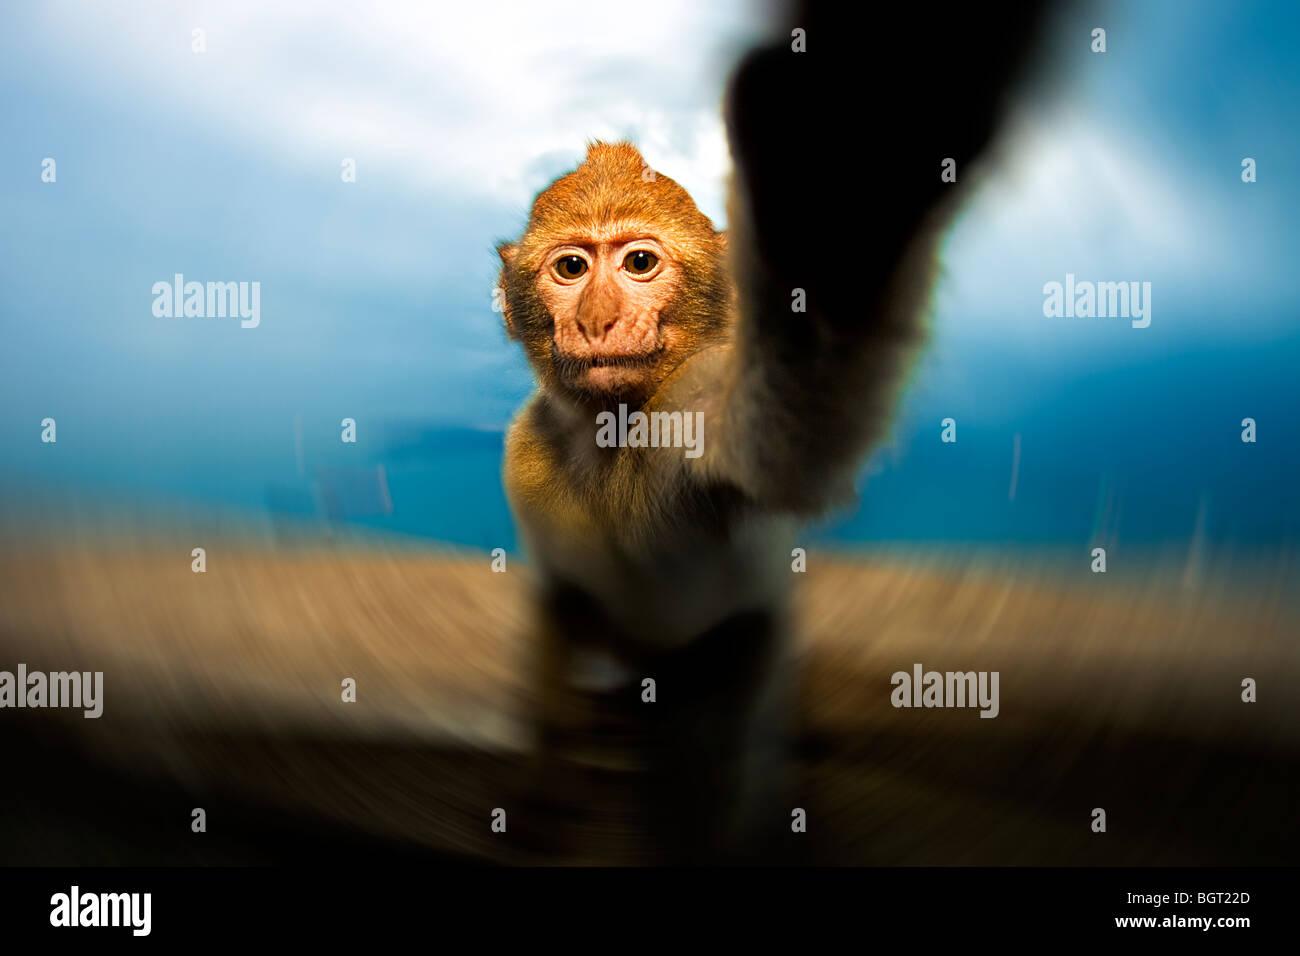 Bébé singe (Macaca sylvanus) atteindre, rocher de Gibraltar, Royaume-Uni Photo Stock